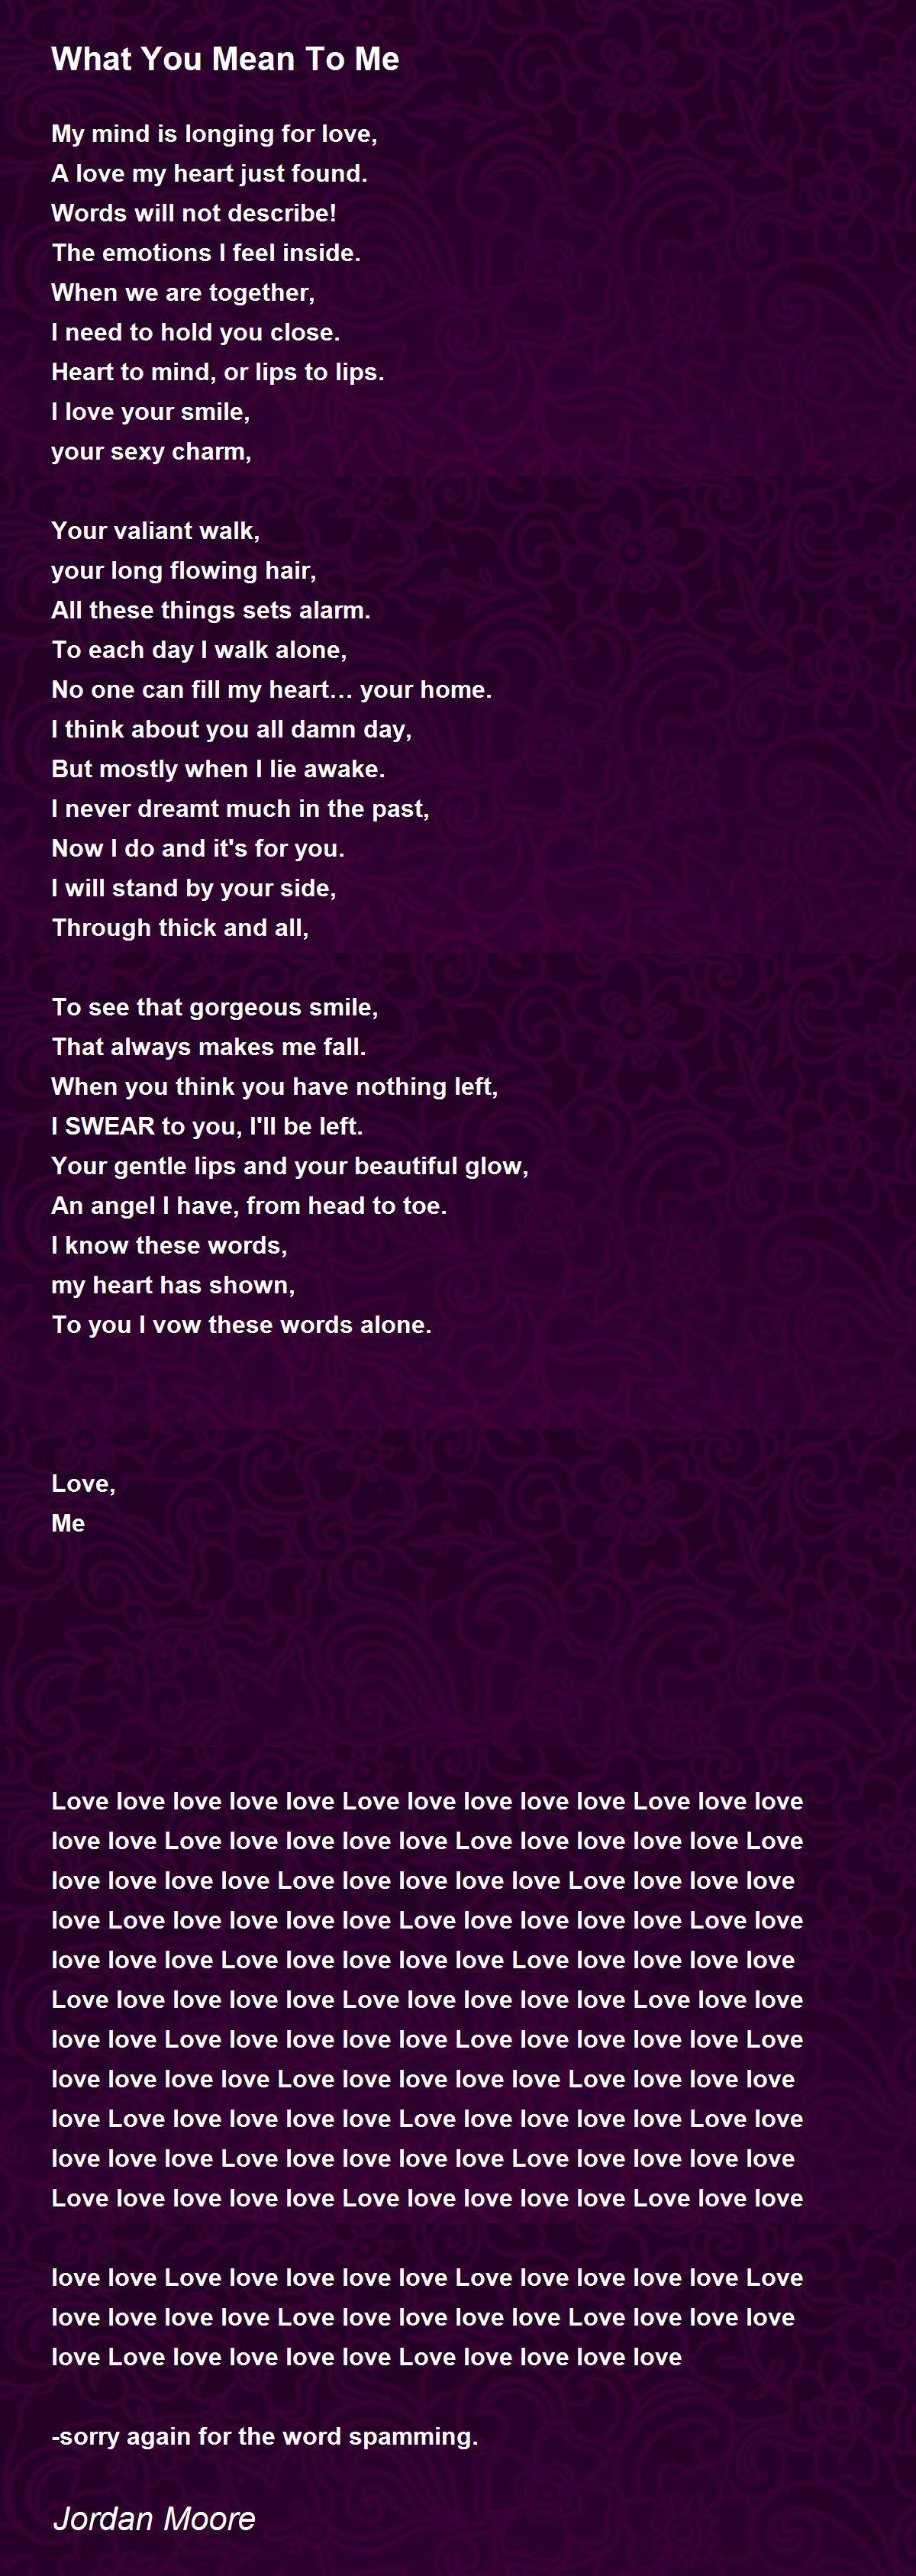 What You Mean To Me Poem by Jordan Moore - Poem Hunter